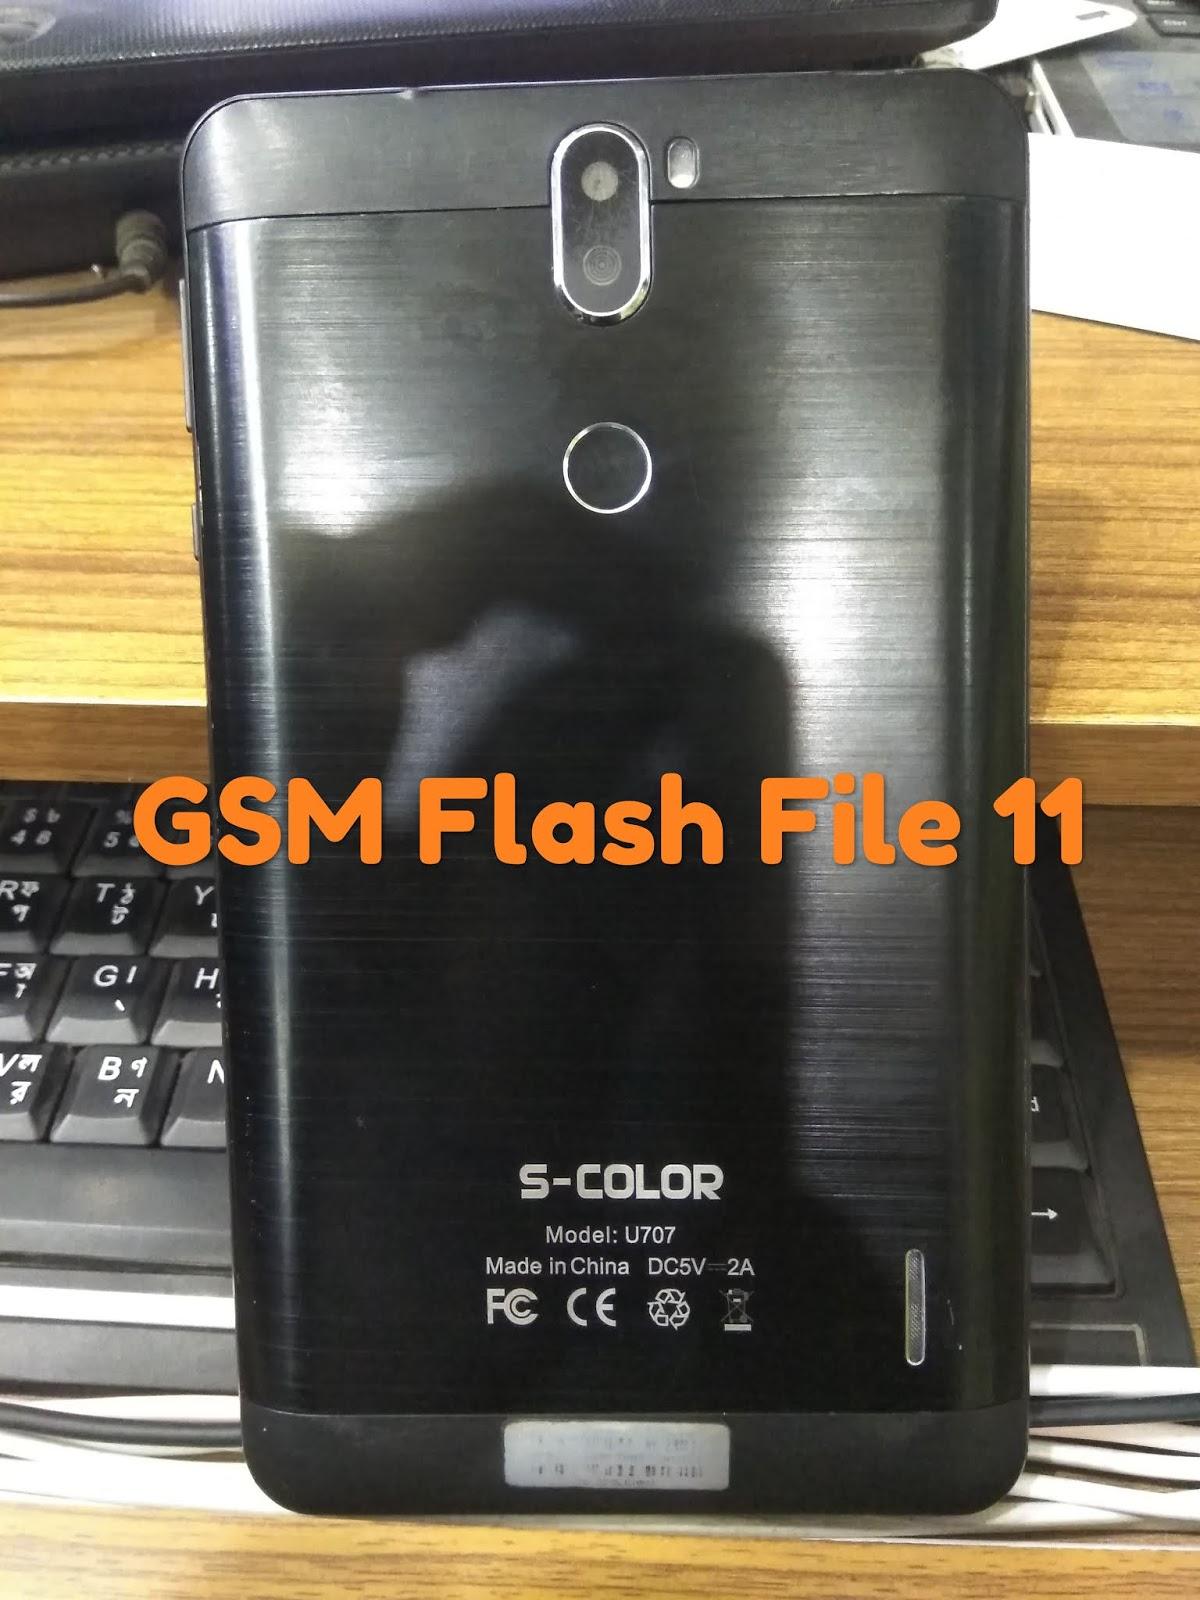 MT6572__U707__U707__U707__7 0__KT07C 3G-20151008 Flash File